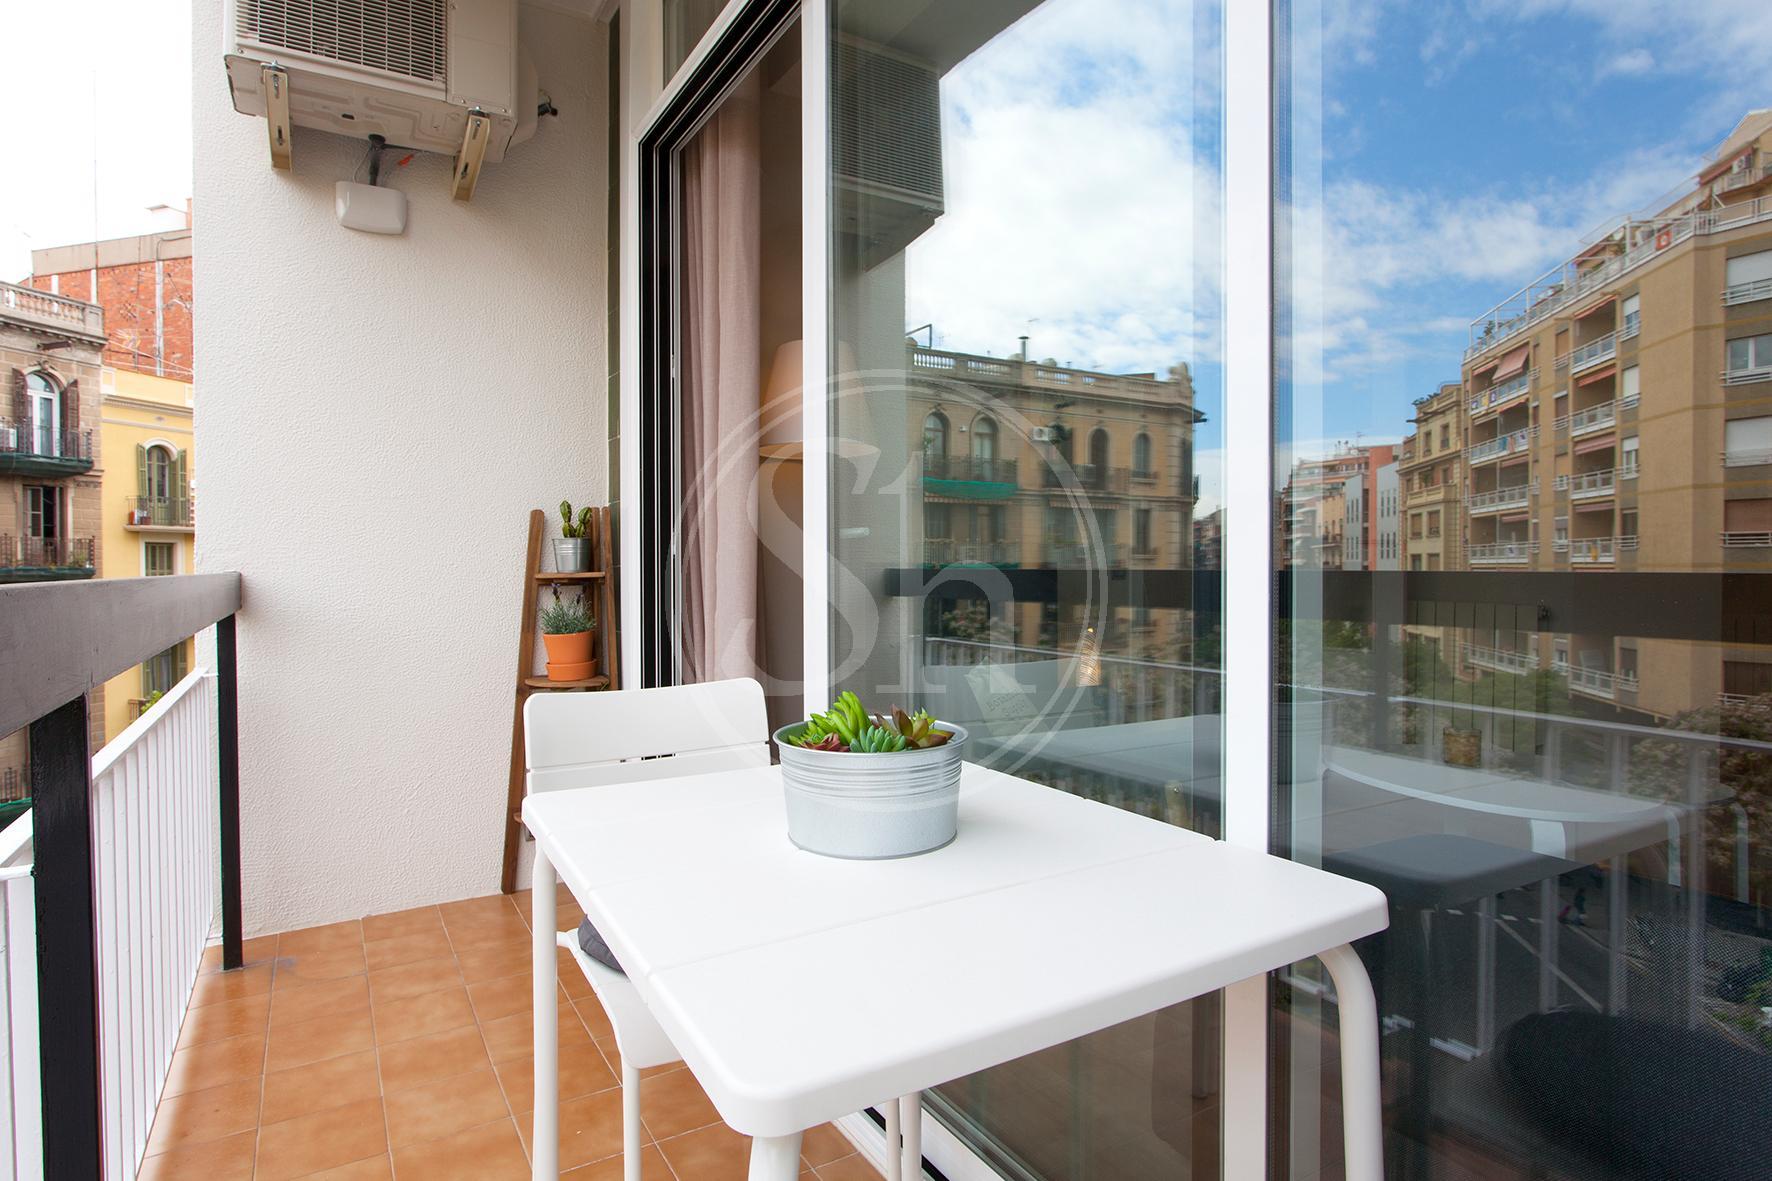 Piso en alquiler barcelona l 39 eixample mallorca sagrada familia - Alquiler pisos barcelona eixample ...